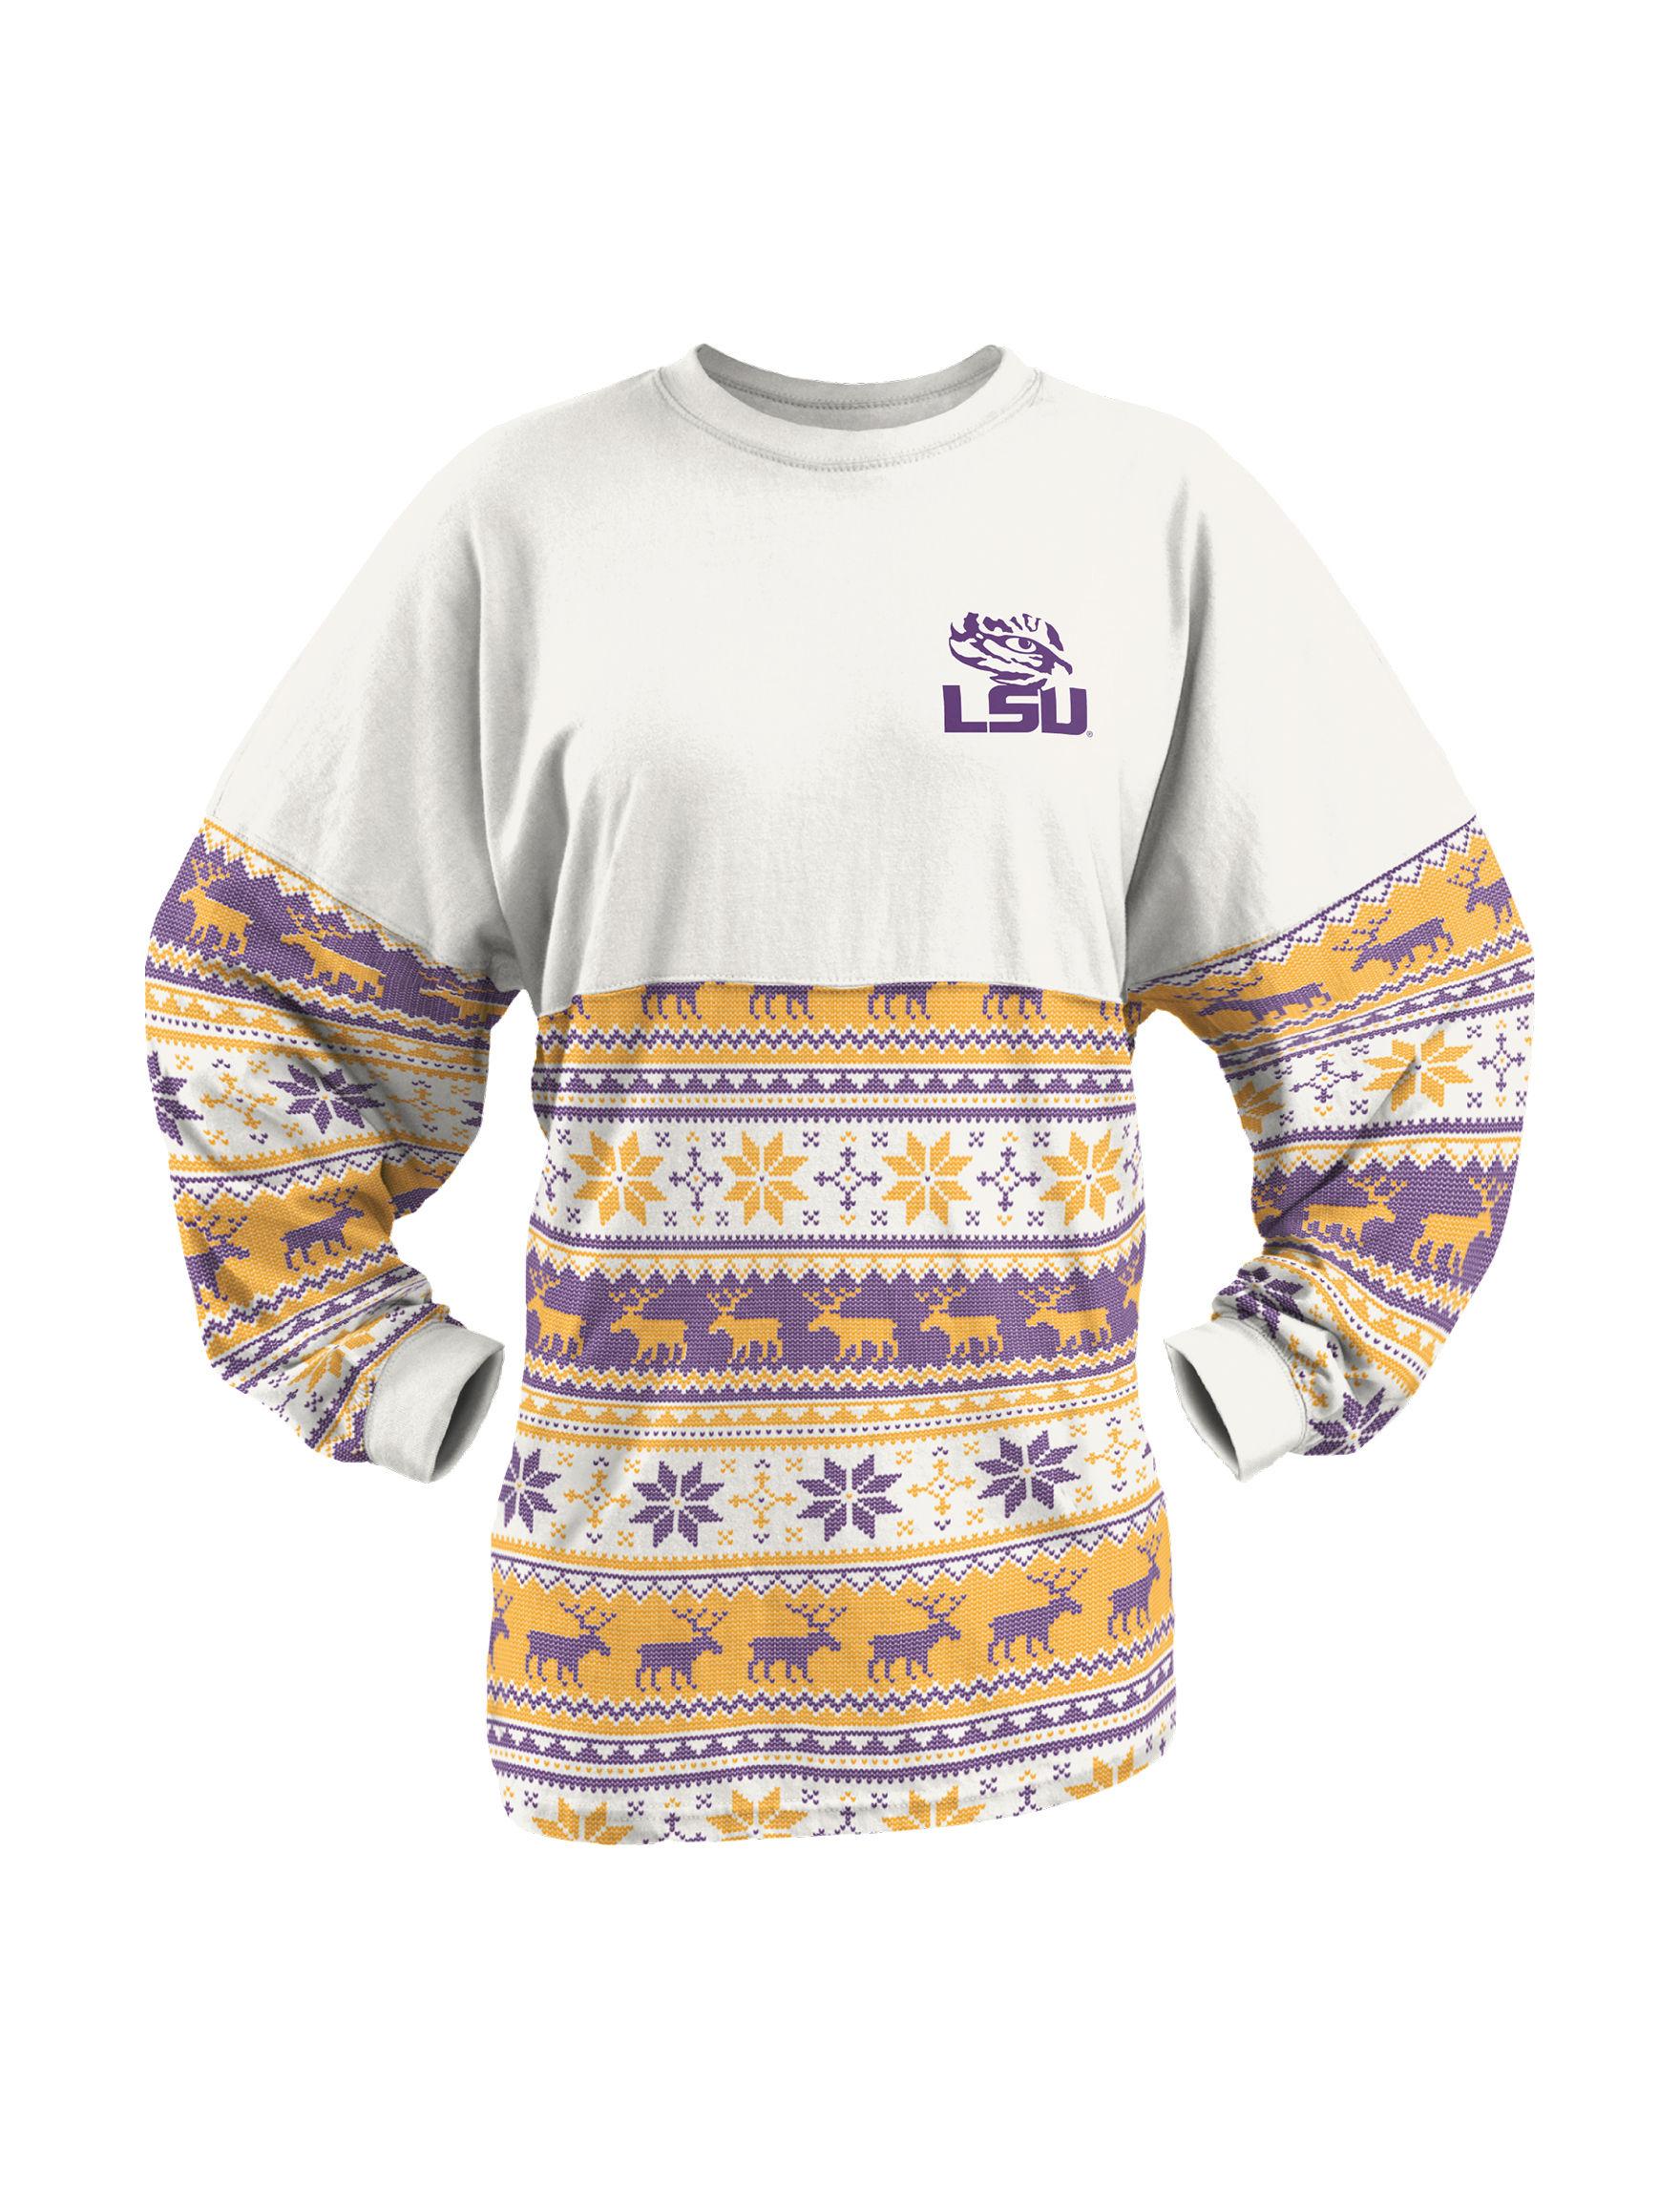 NCAA White Pull-overs Shirts & Blouses Tees & Tanks NCAA